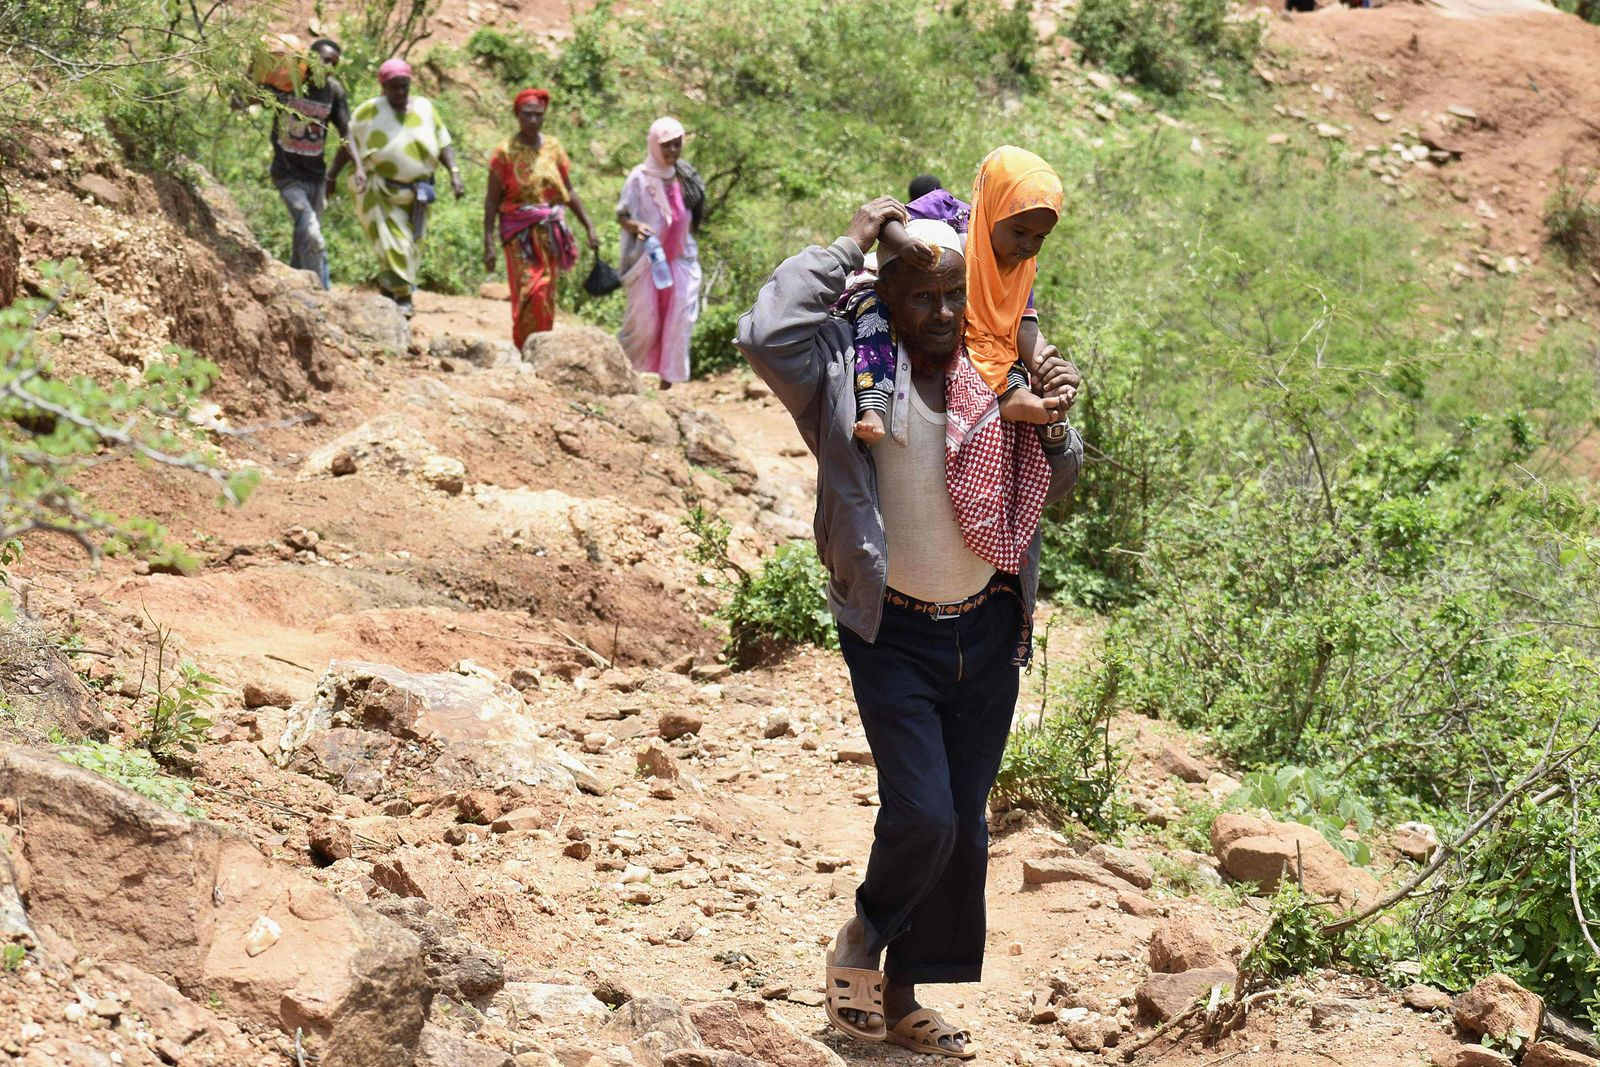 KENYA-ETHIOPIA-UNREST-REFUGEES